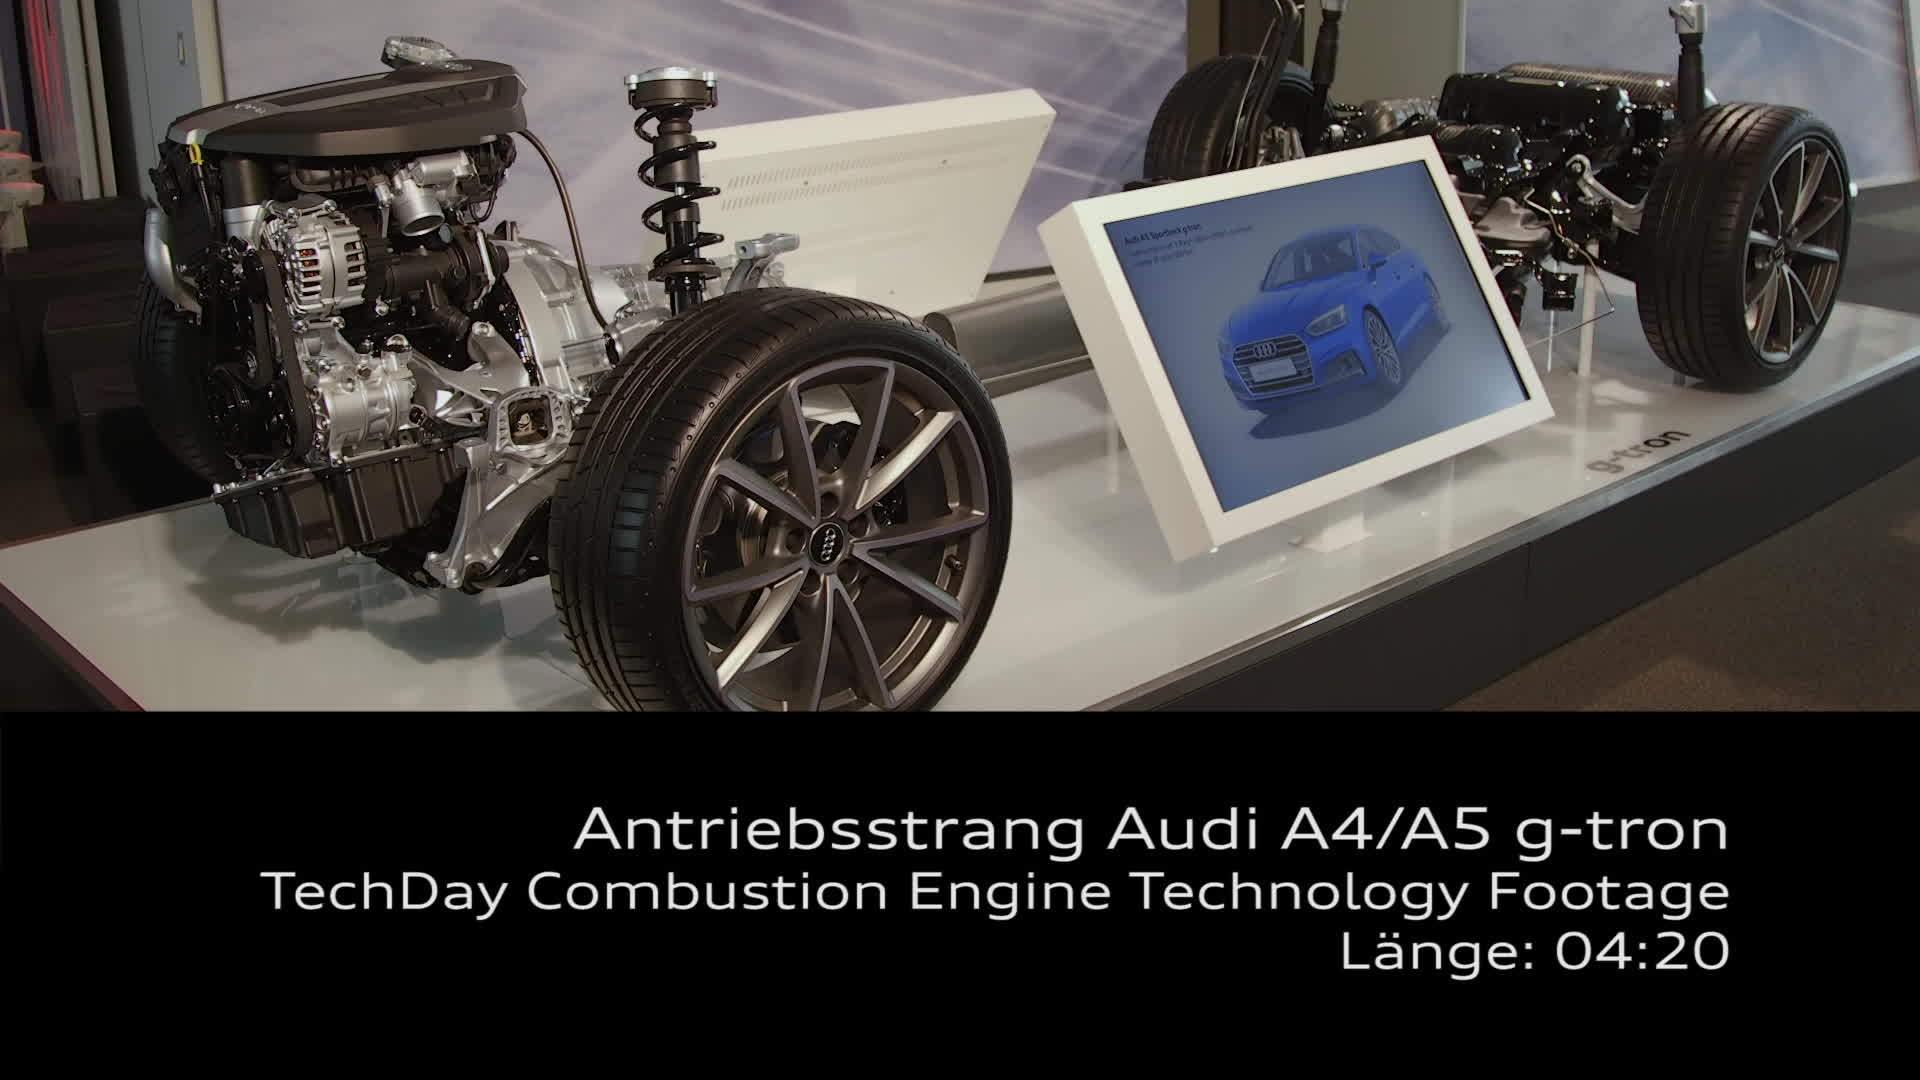 Footage Antriebsstrang Audi A4/A5 g-tron